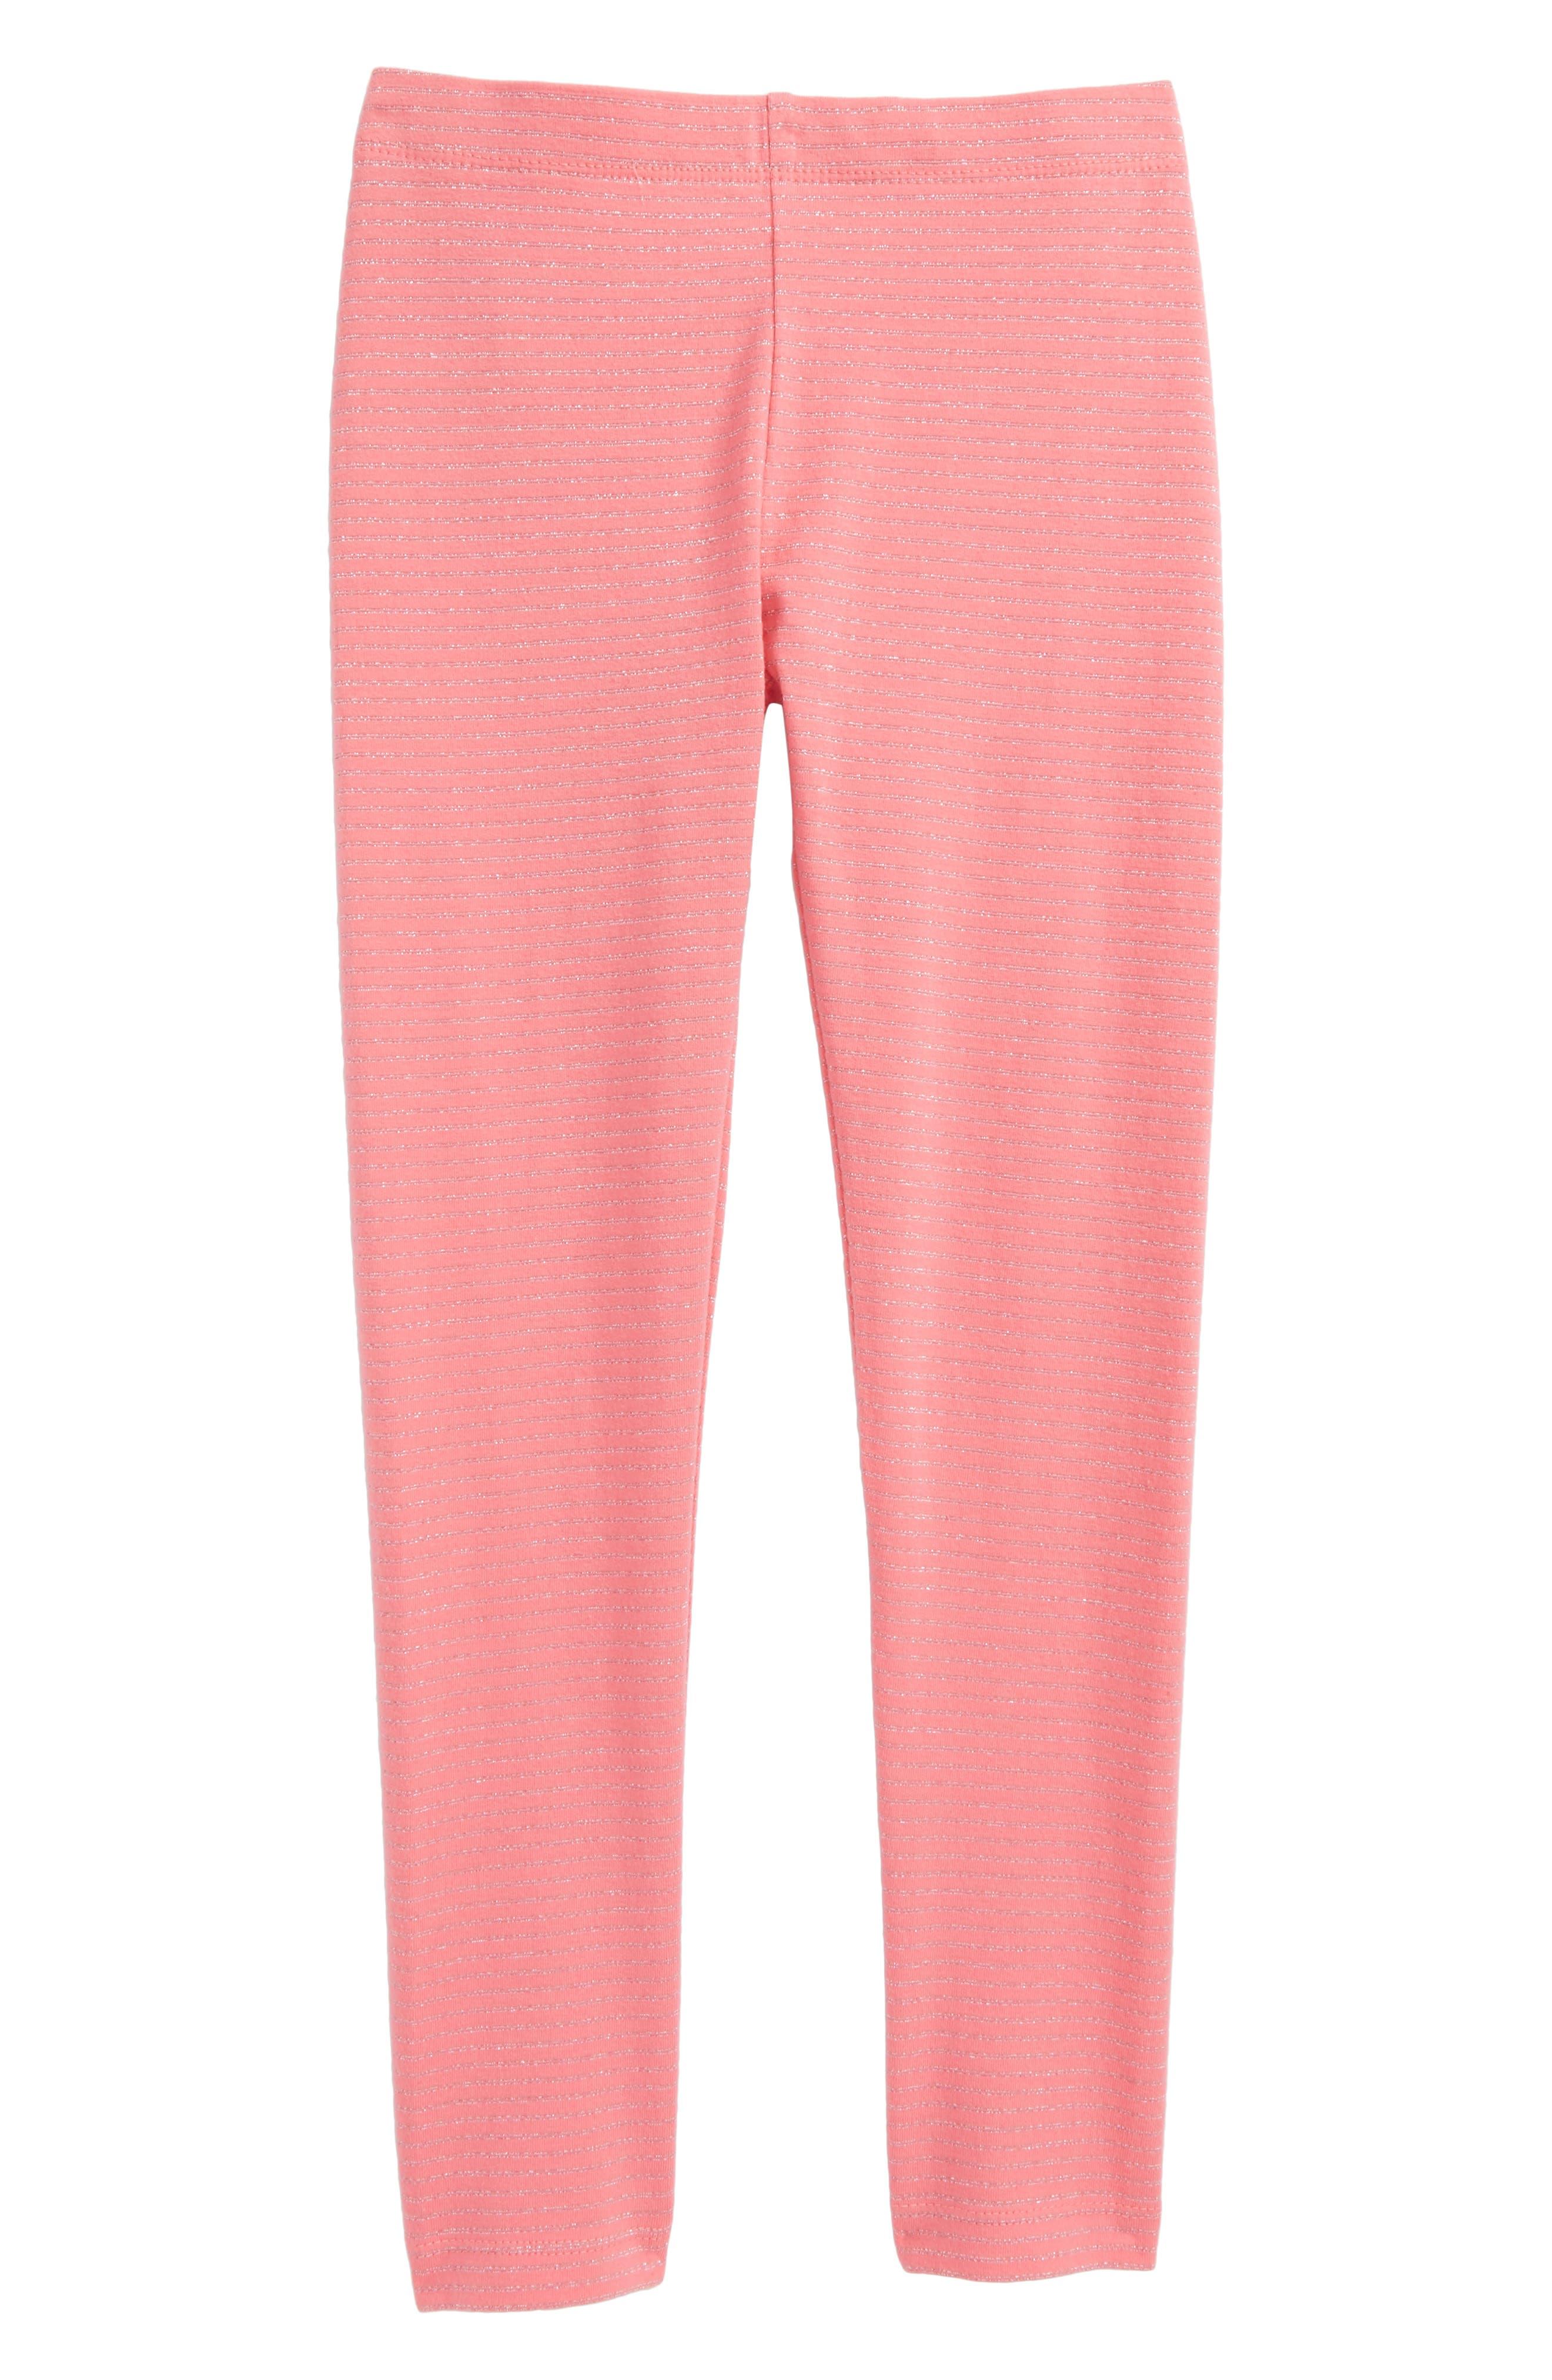 Sparkle Stripe Leggings,                             Main thumbnail 1, color,                             Pink Lemonade Sparkle Stripe